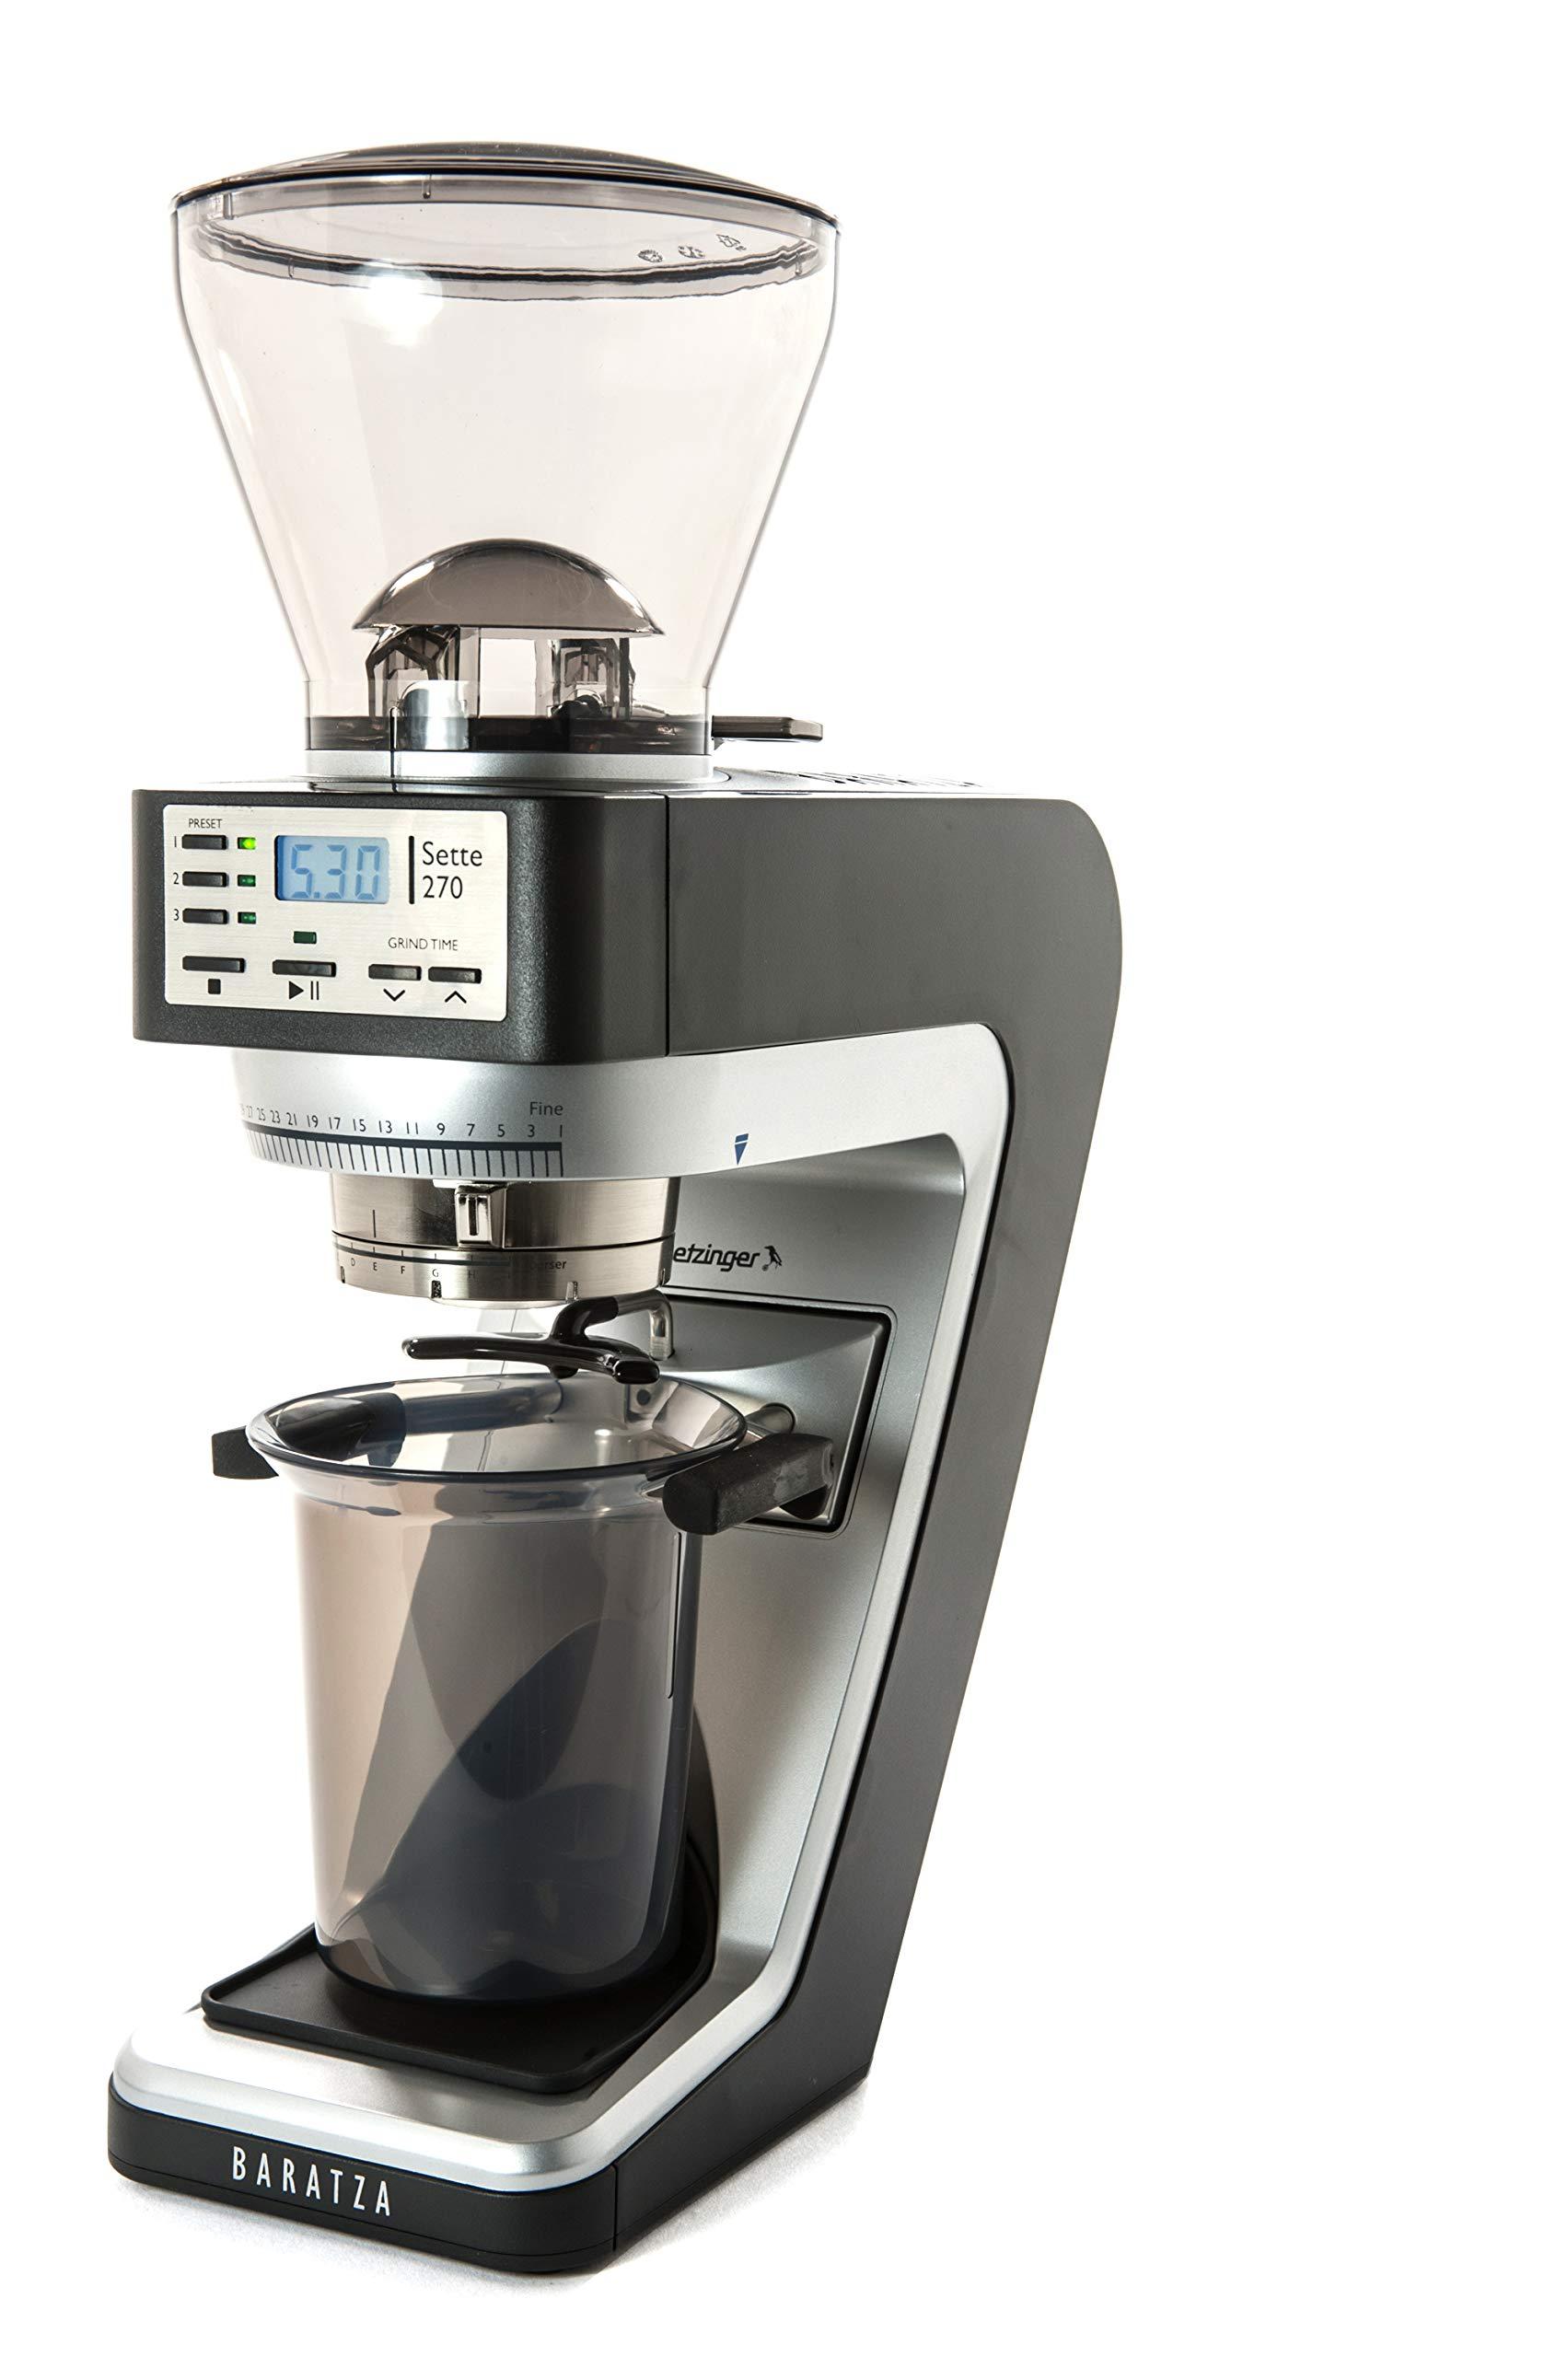 Baratza Sette 270 Conical Burr Coffee Grinder for Espresso Grind and Other Fine Grind Brewing Methods Only